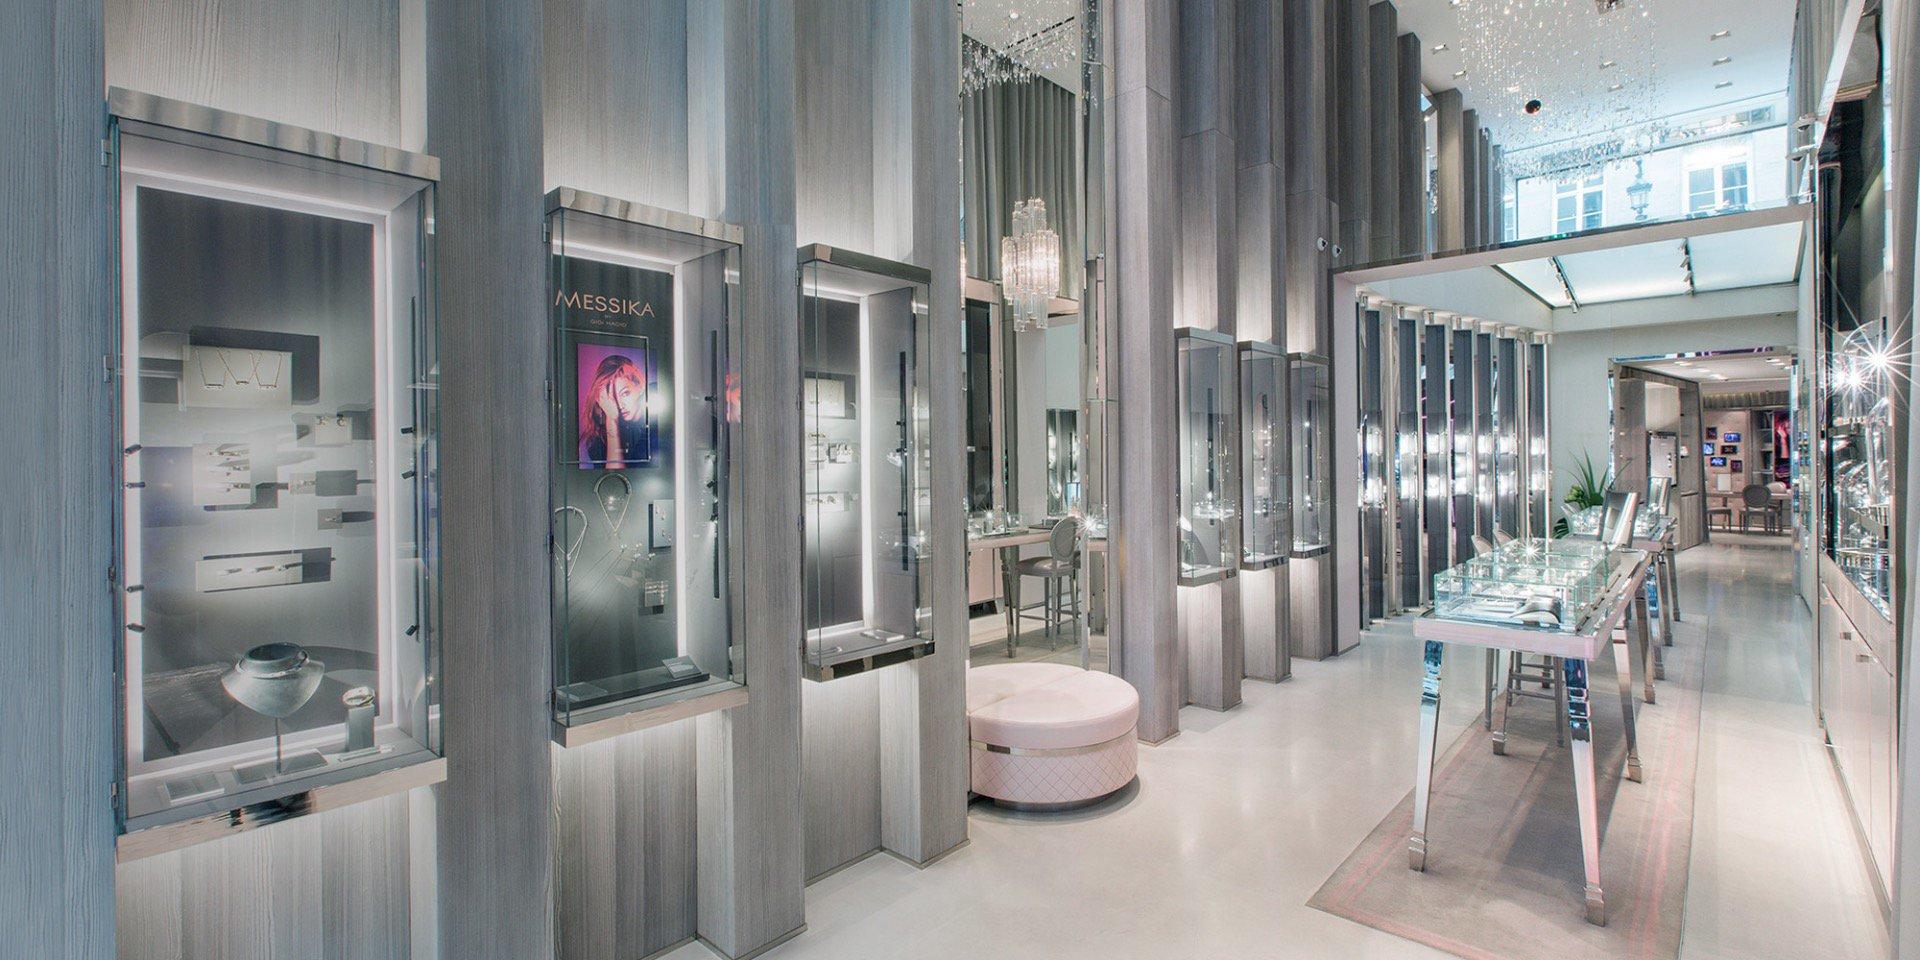 messika-flagship-store-259-rue-saint-honore-paris